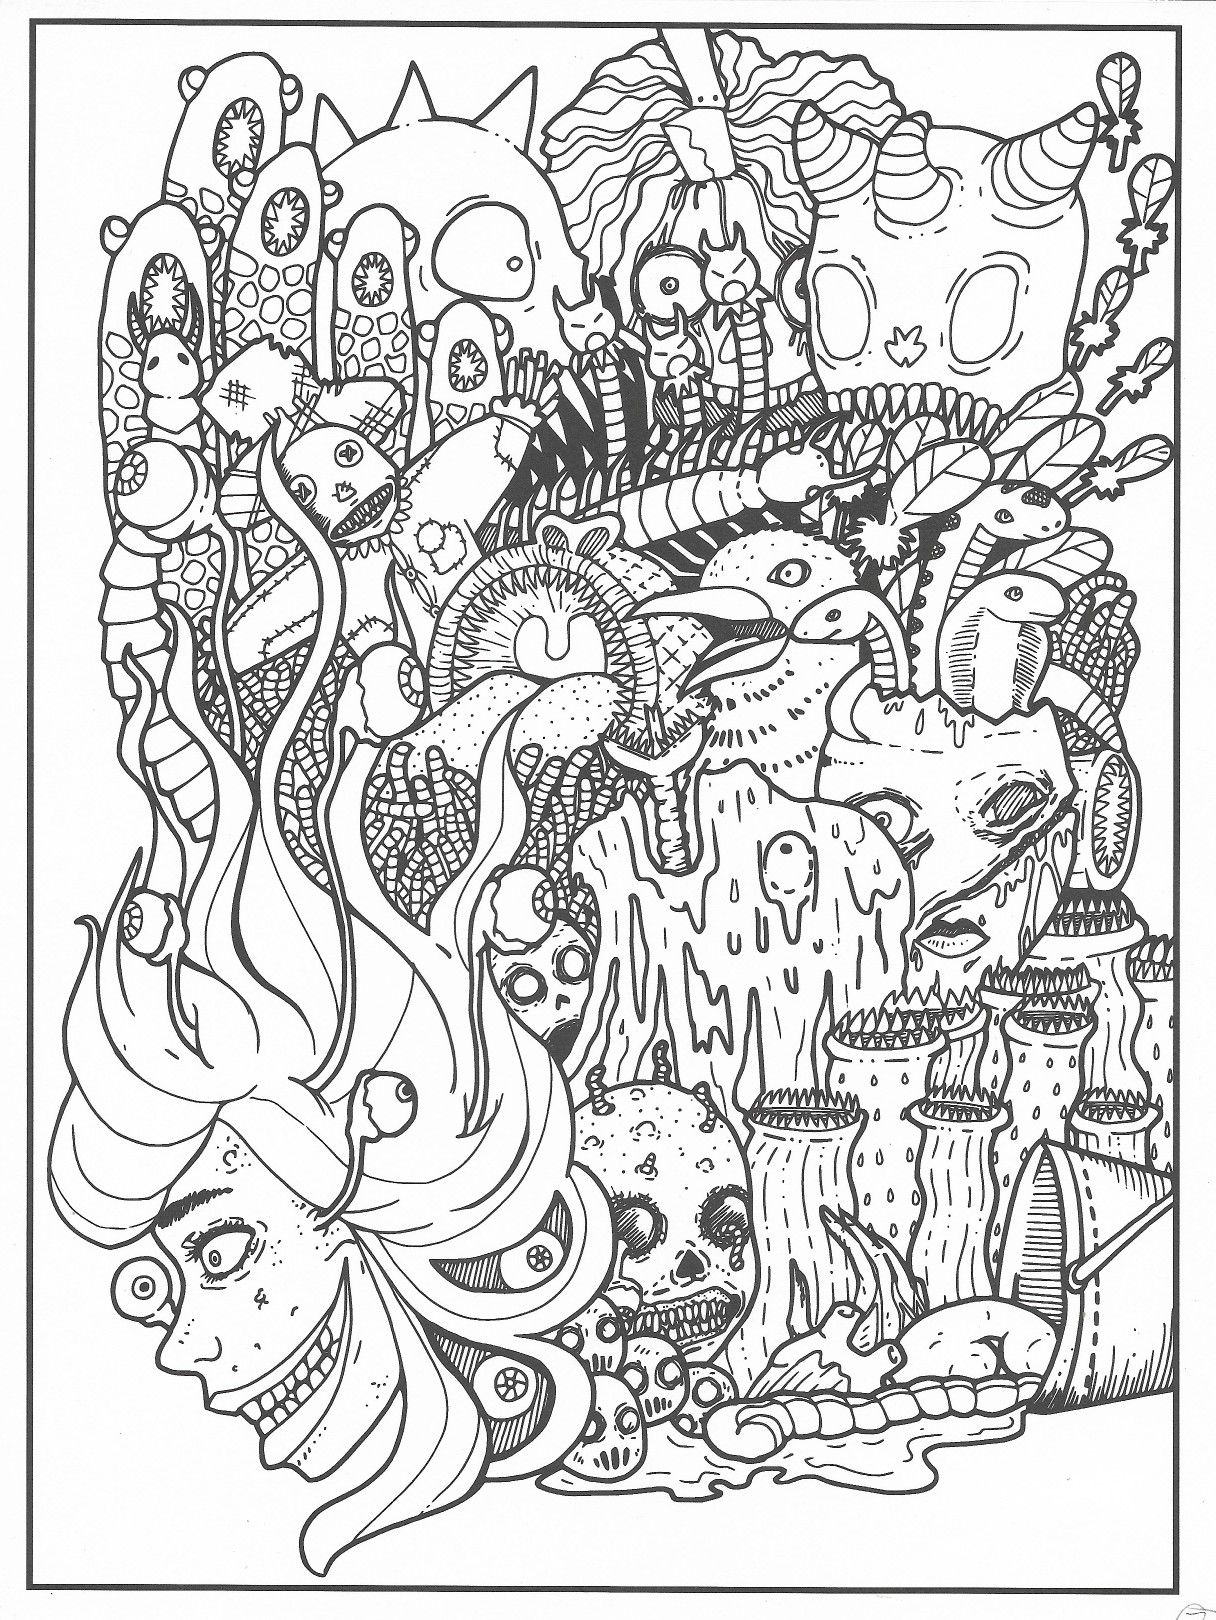 Badass Coloring Pages : badass, coloring, pages, Angie, Burtt, Badass, Coloring, Pages, Pages,, Drawings